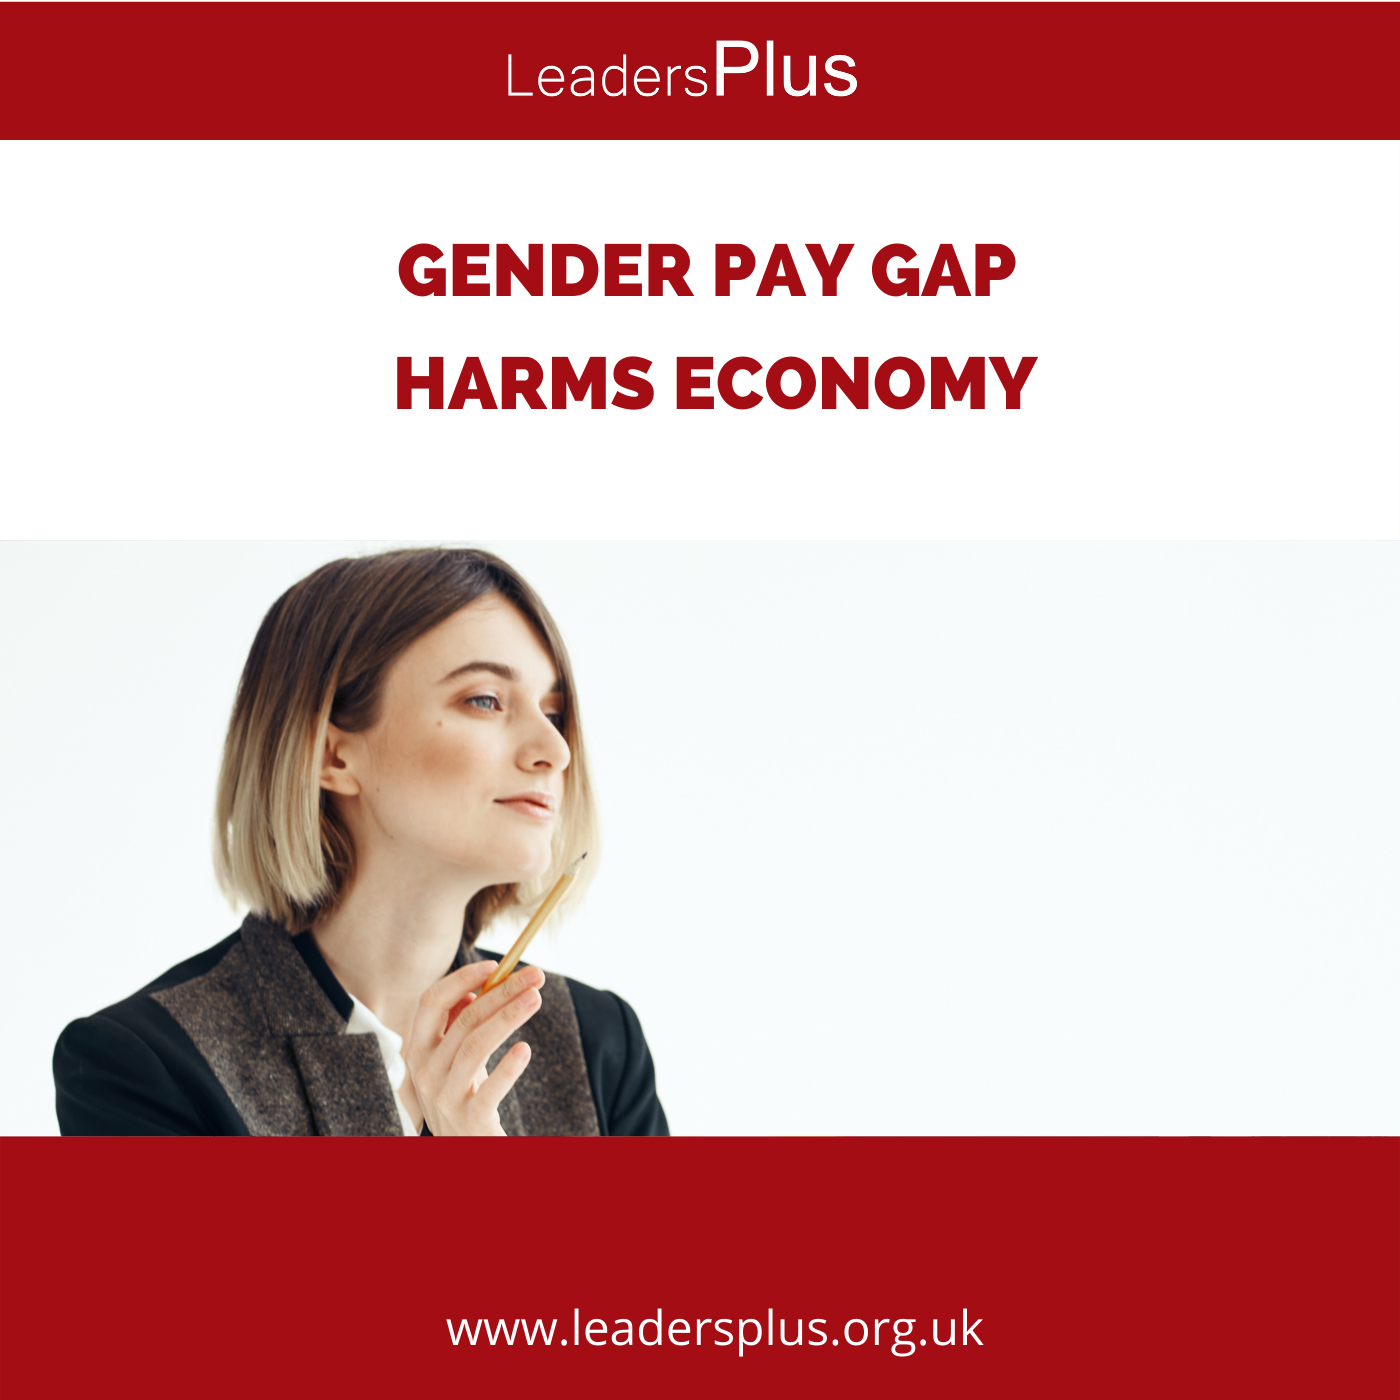 gender pay gap harms economy